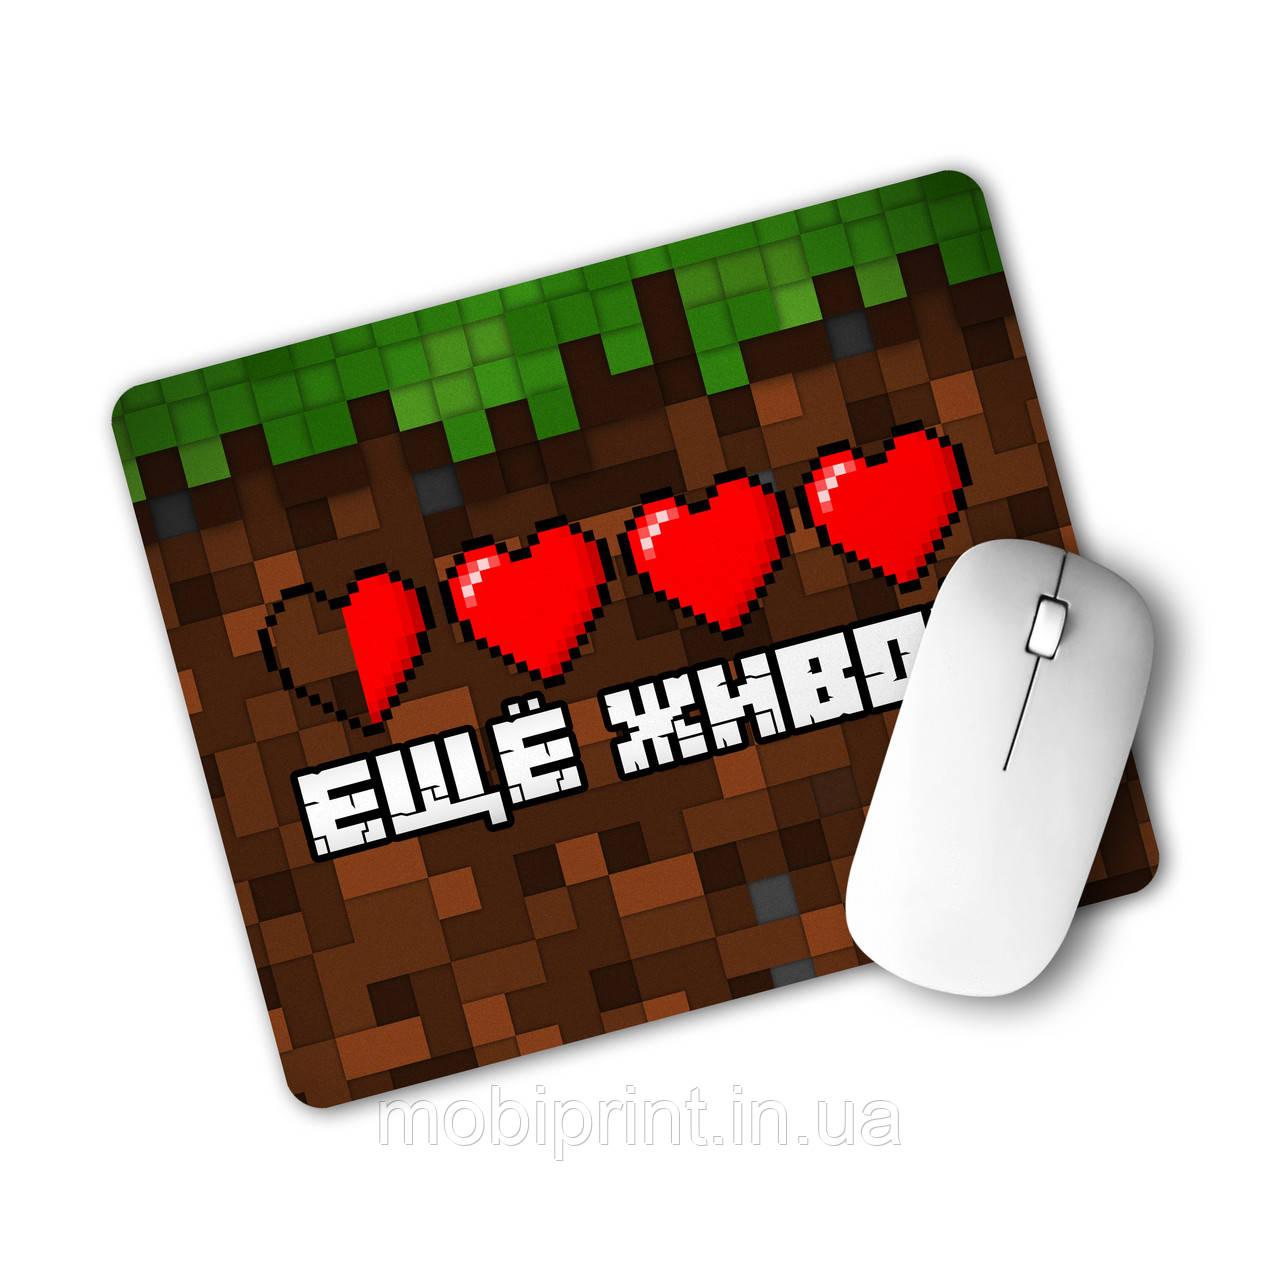 Коврик для мышки Майнкрафт (Minecraft)  (25108-1172)